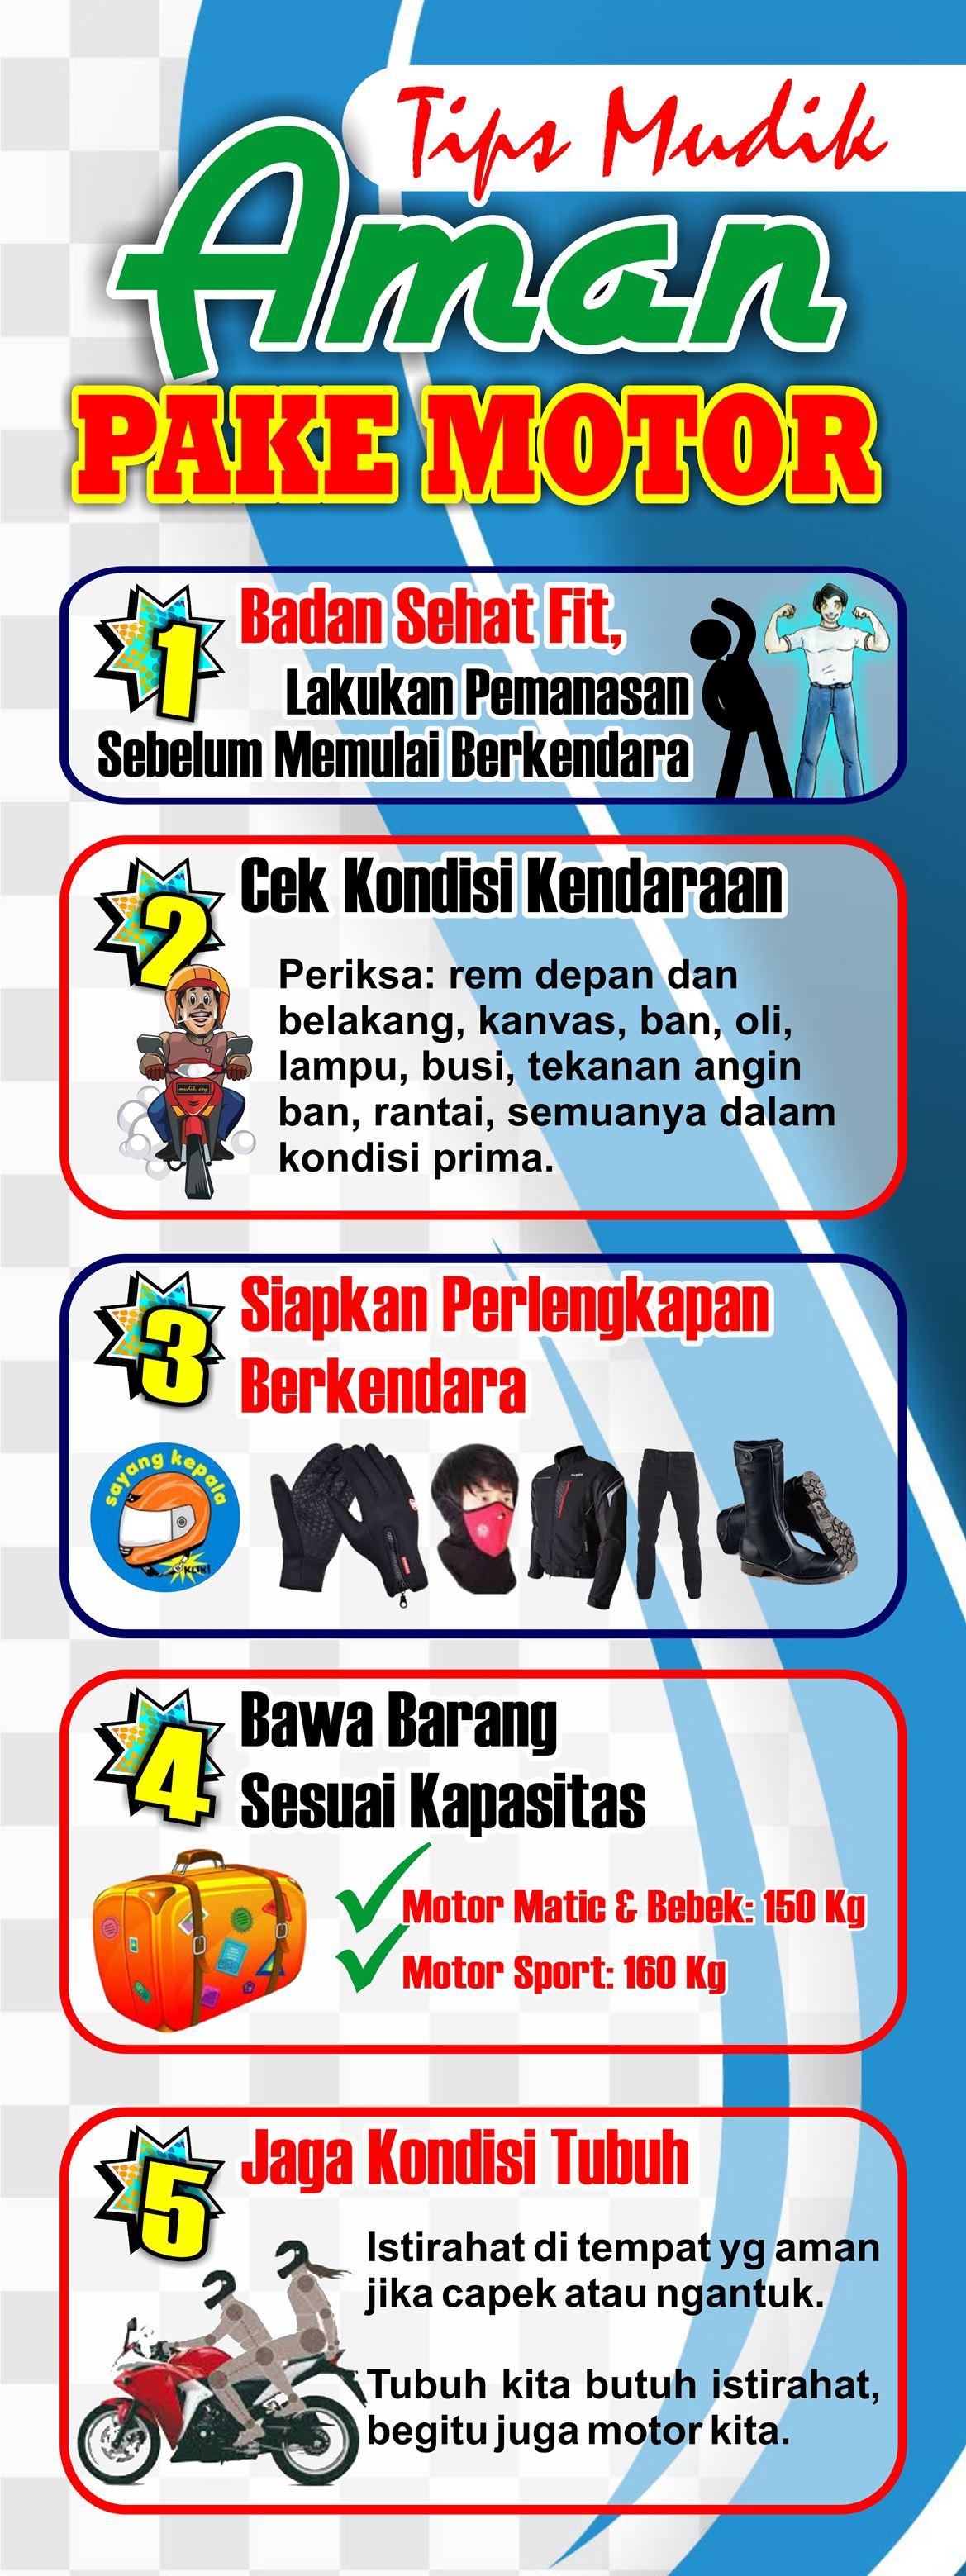 3 Standing Banner Tips Mudik Lebaran Desain Cantik Free Download